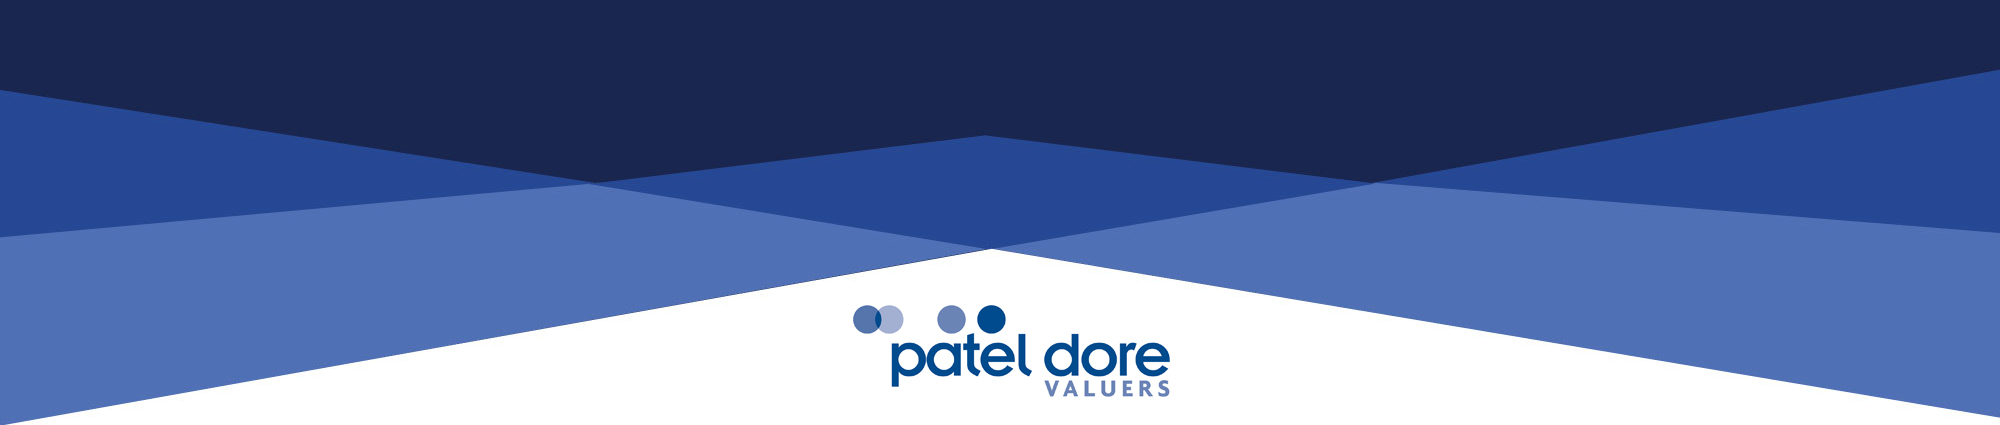 Patel Dore Property Valuers, Melbourne, Australia logo